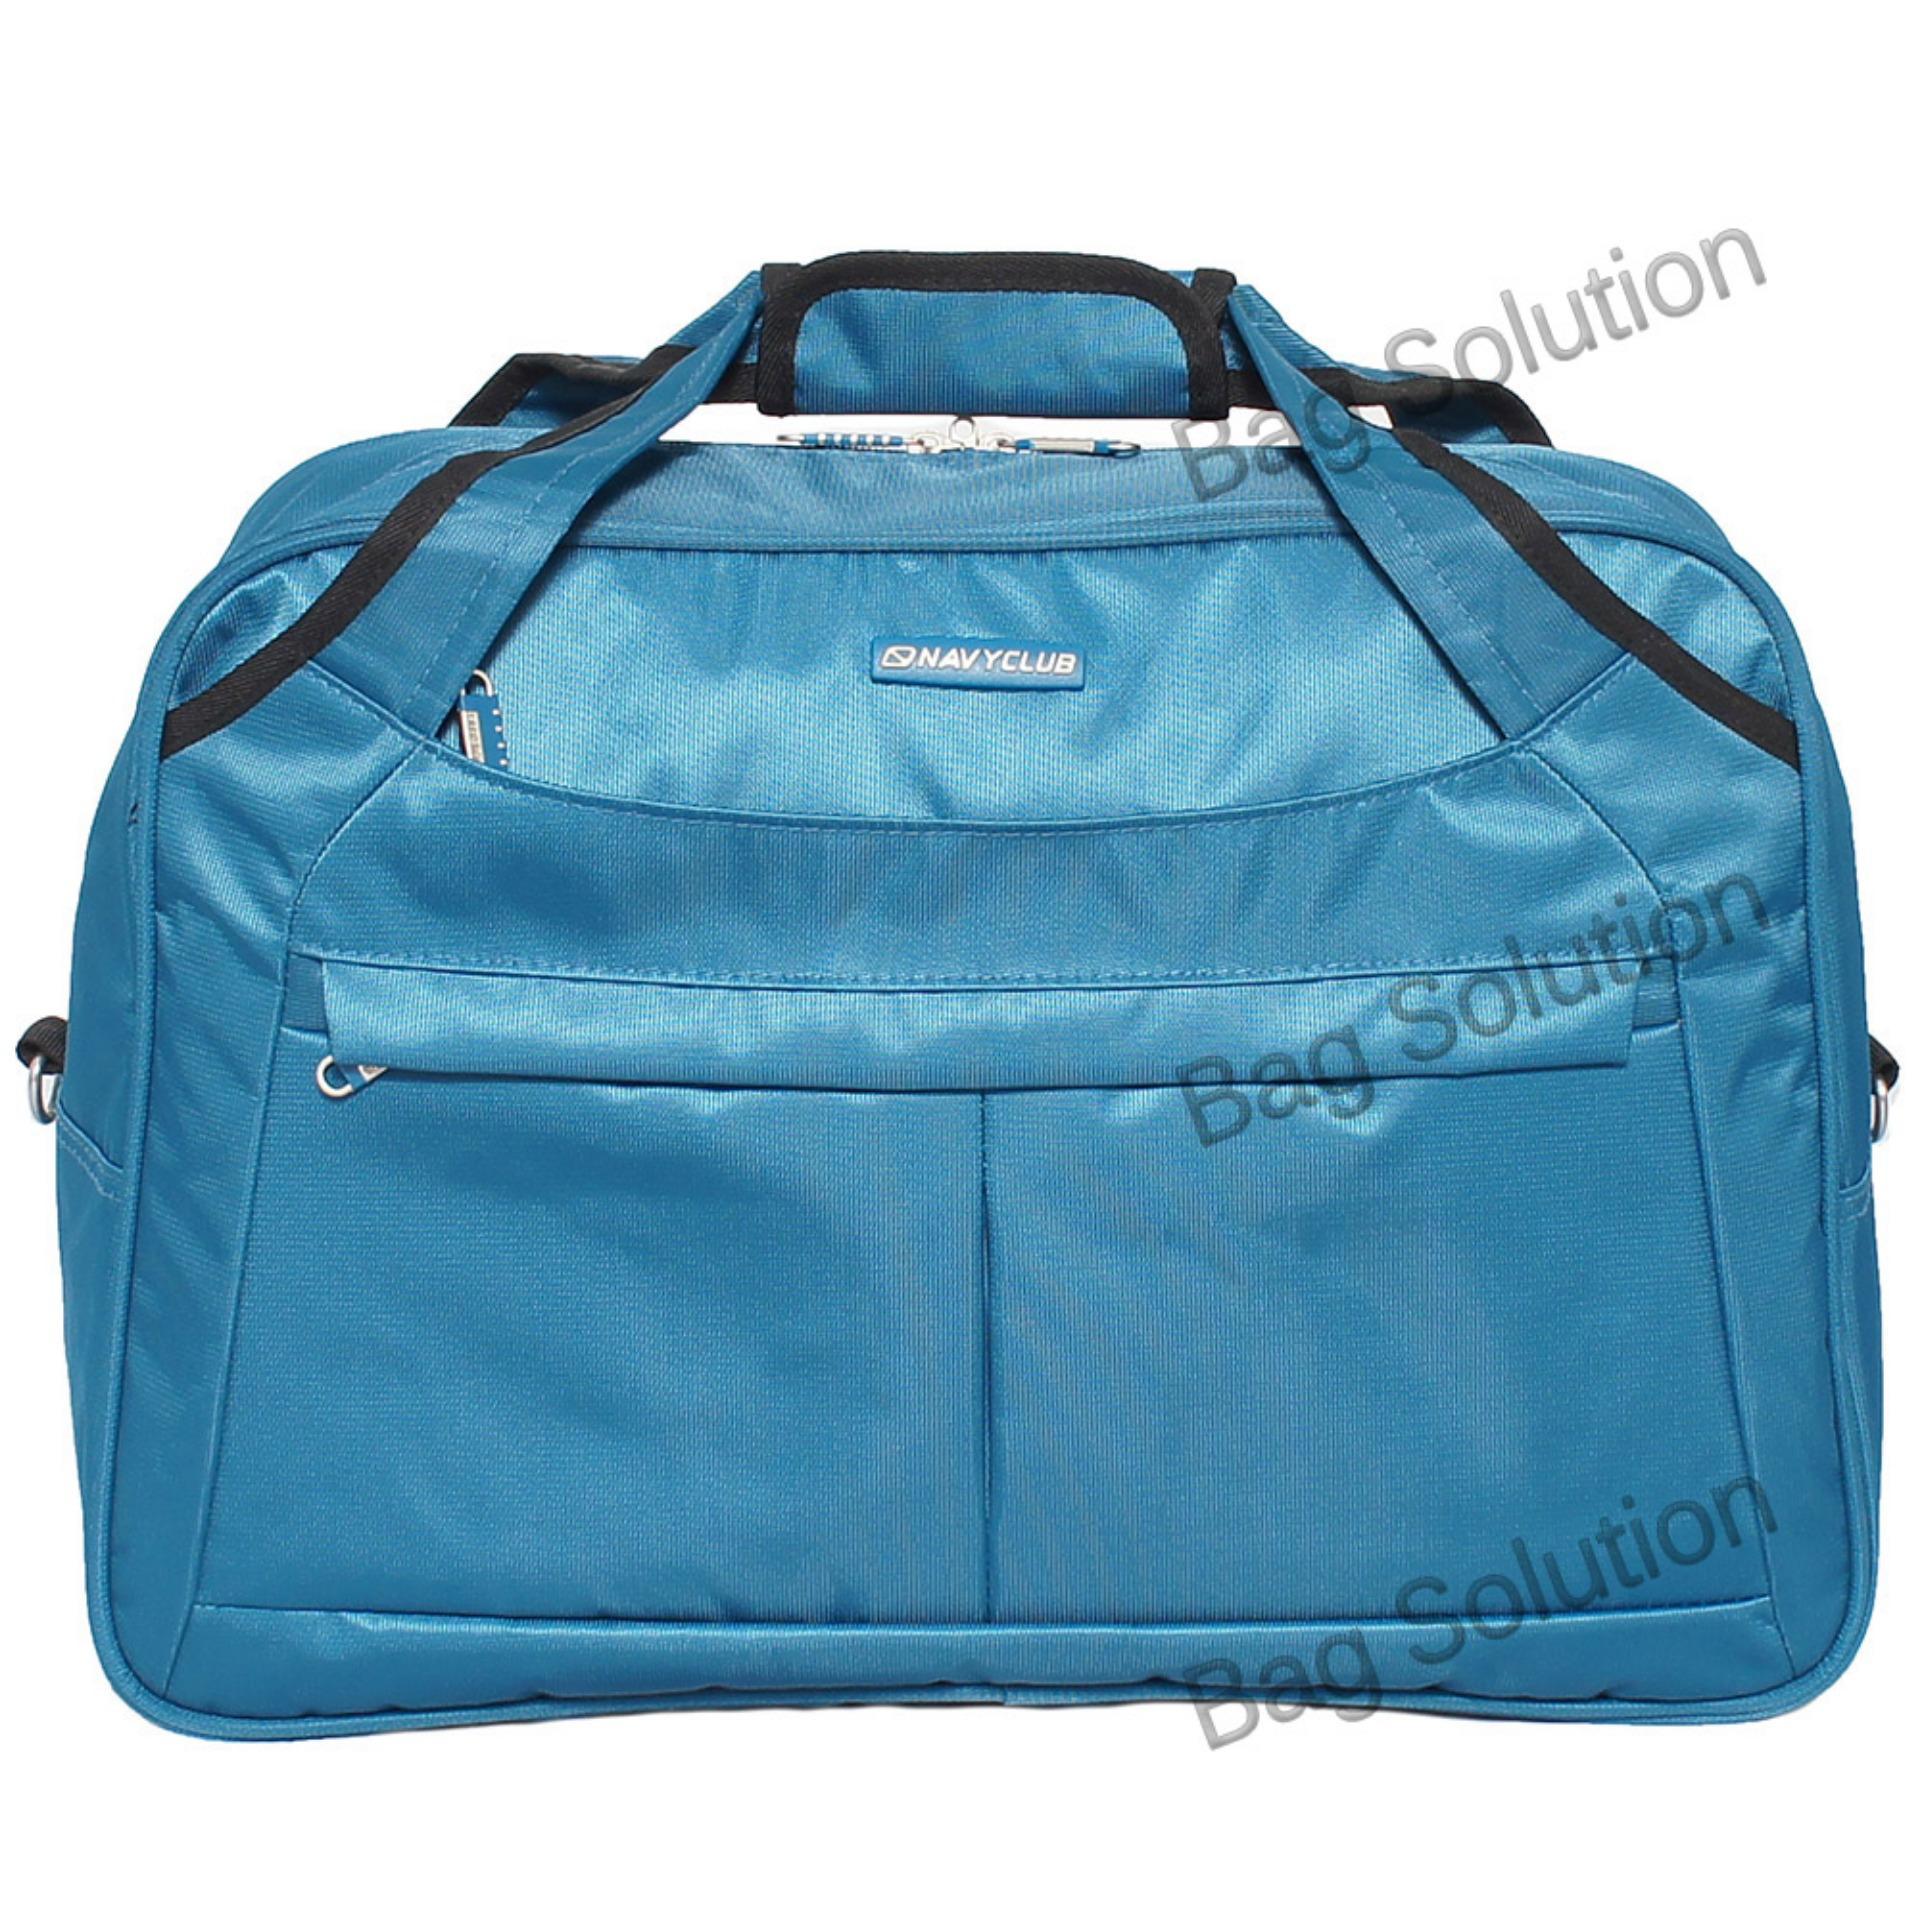 Kianuticket Airlines Tas Travel Bag Backpack Eibag 602 Abu Navy Club Duffle Pakaian Pria Wanita